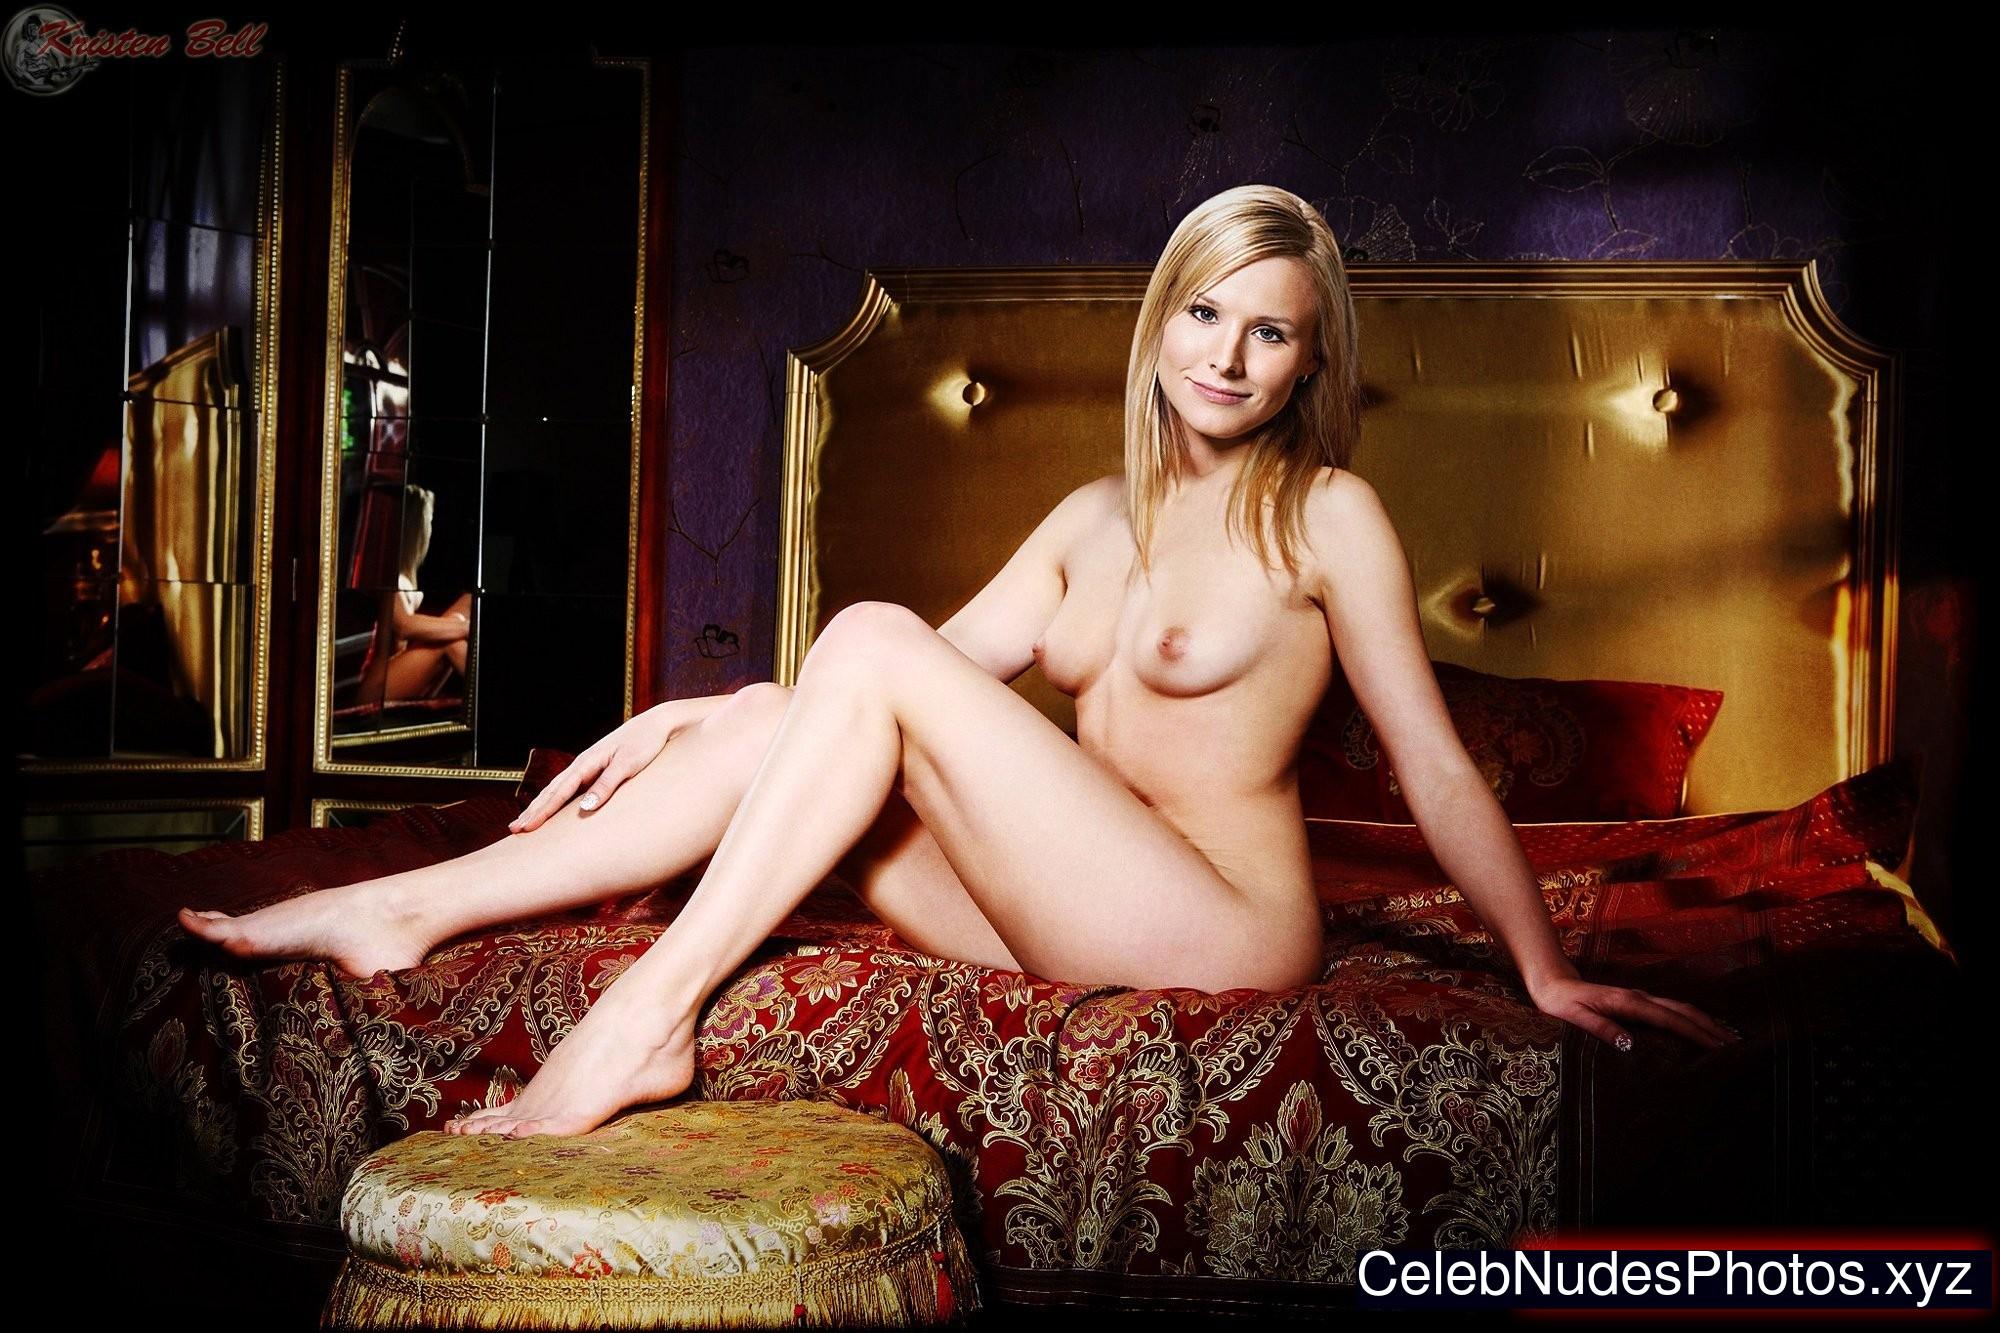 Kristen Bell celebrity nudes